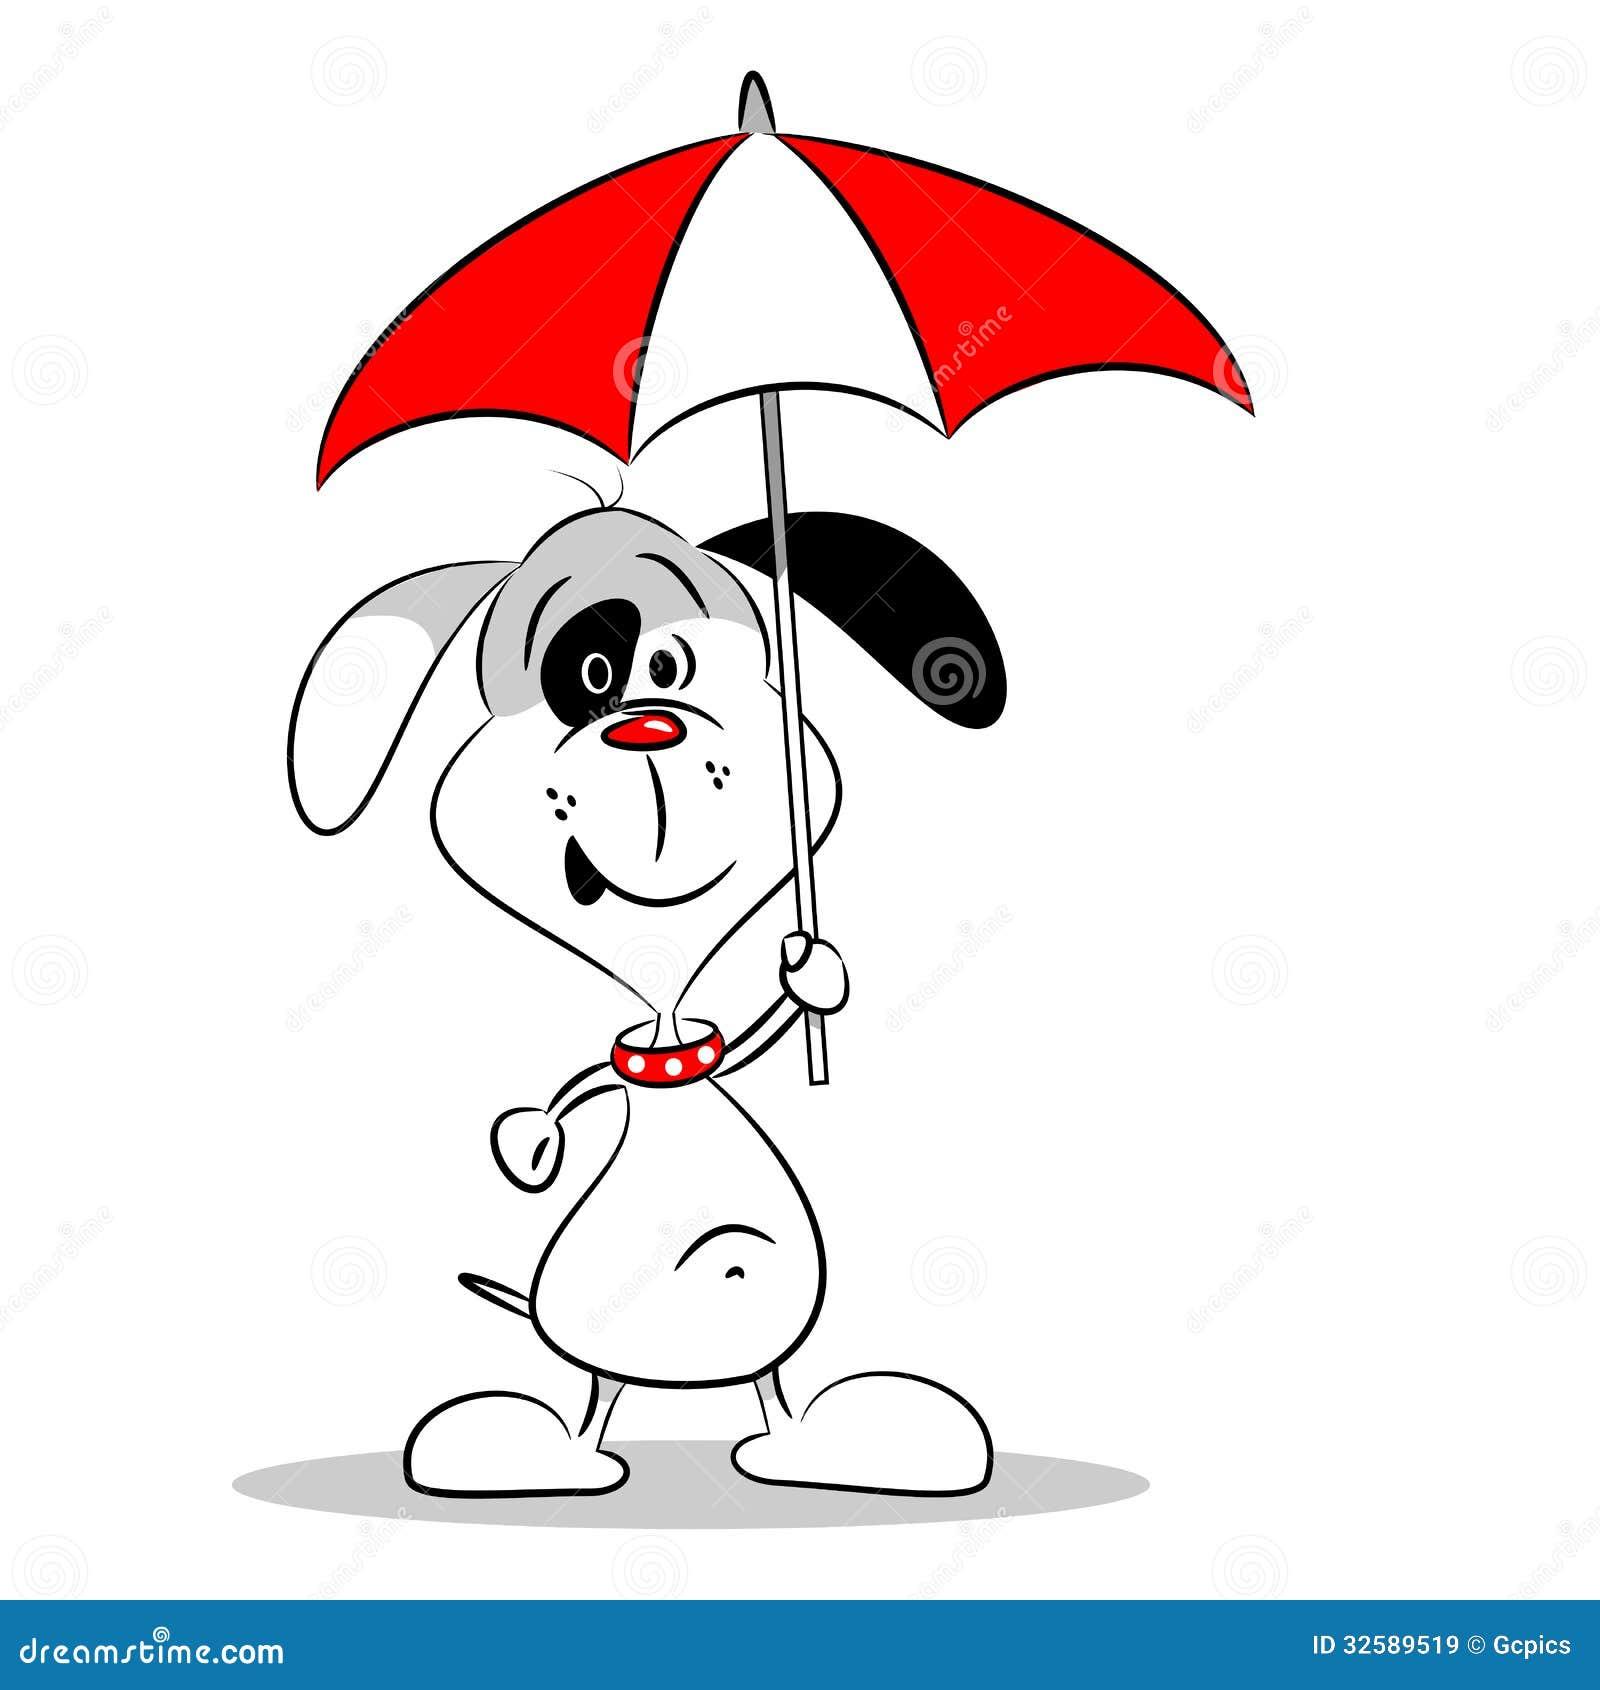 A Cartoon Dog Holding An Umbrella Royalty Free Stock ... Relaxing Dog Music